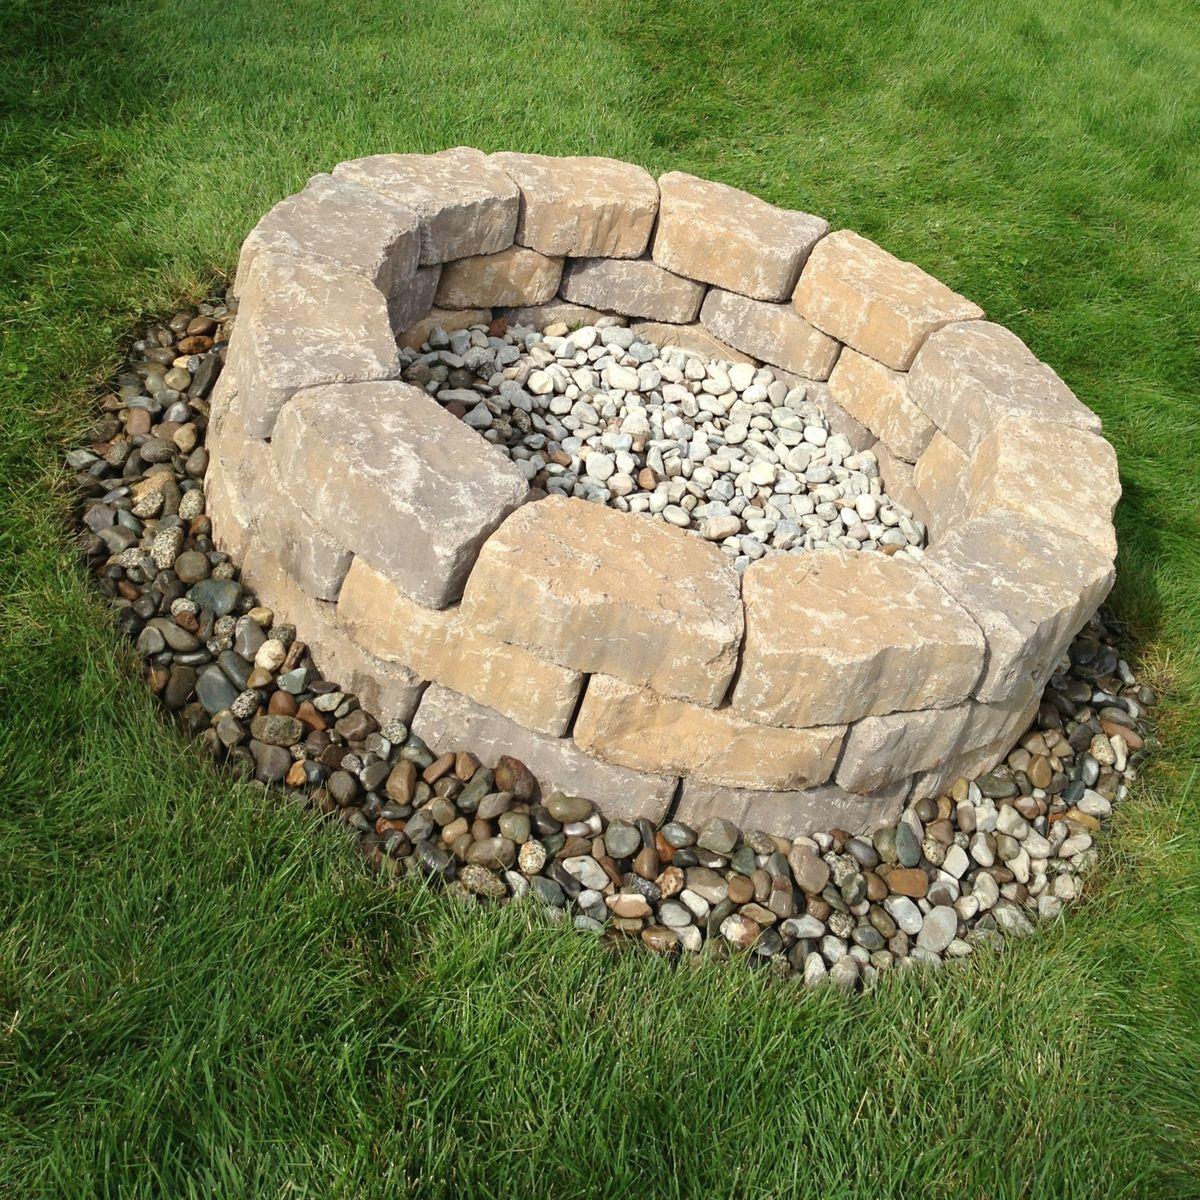 Backyard Fire Pit Landscaping Ideas: Pin By Kim Pressler On Patio